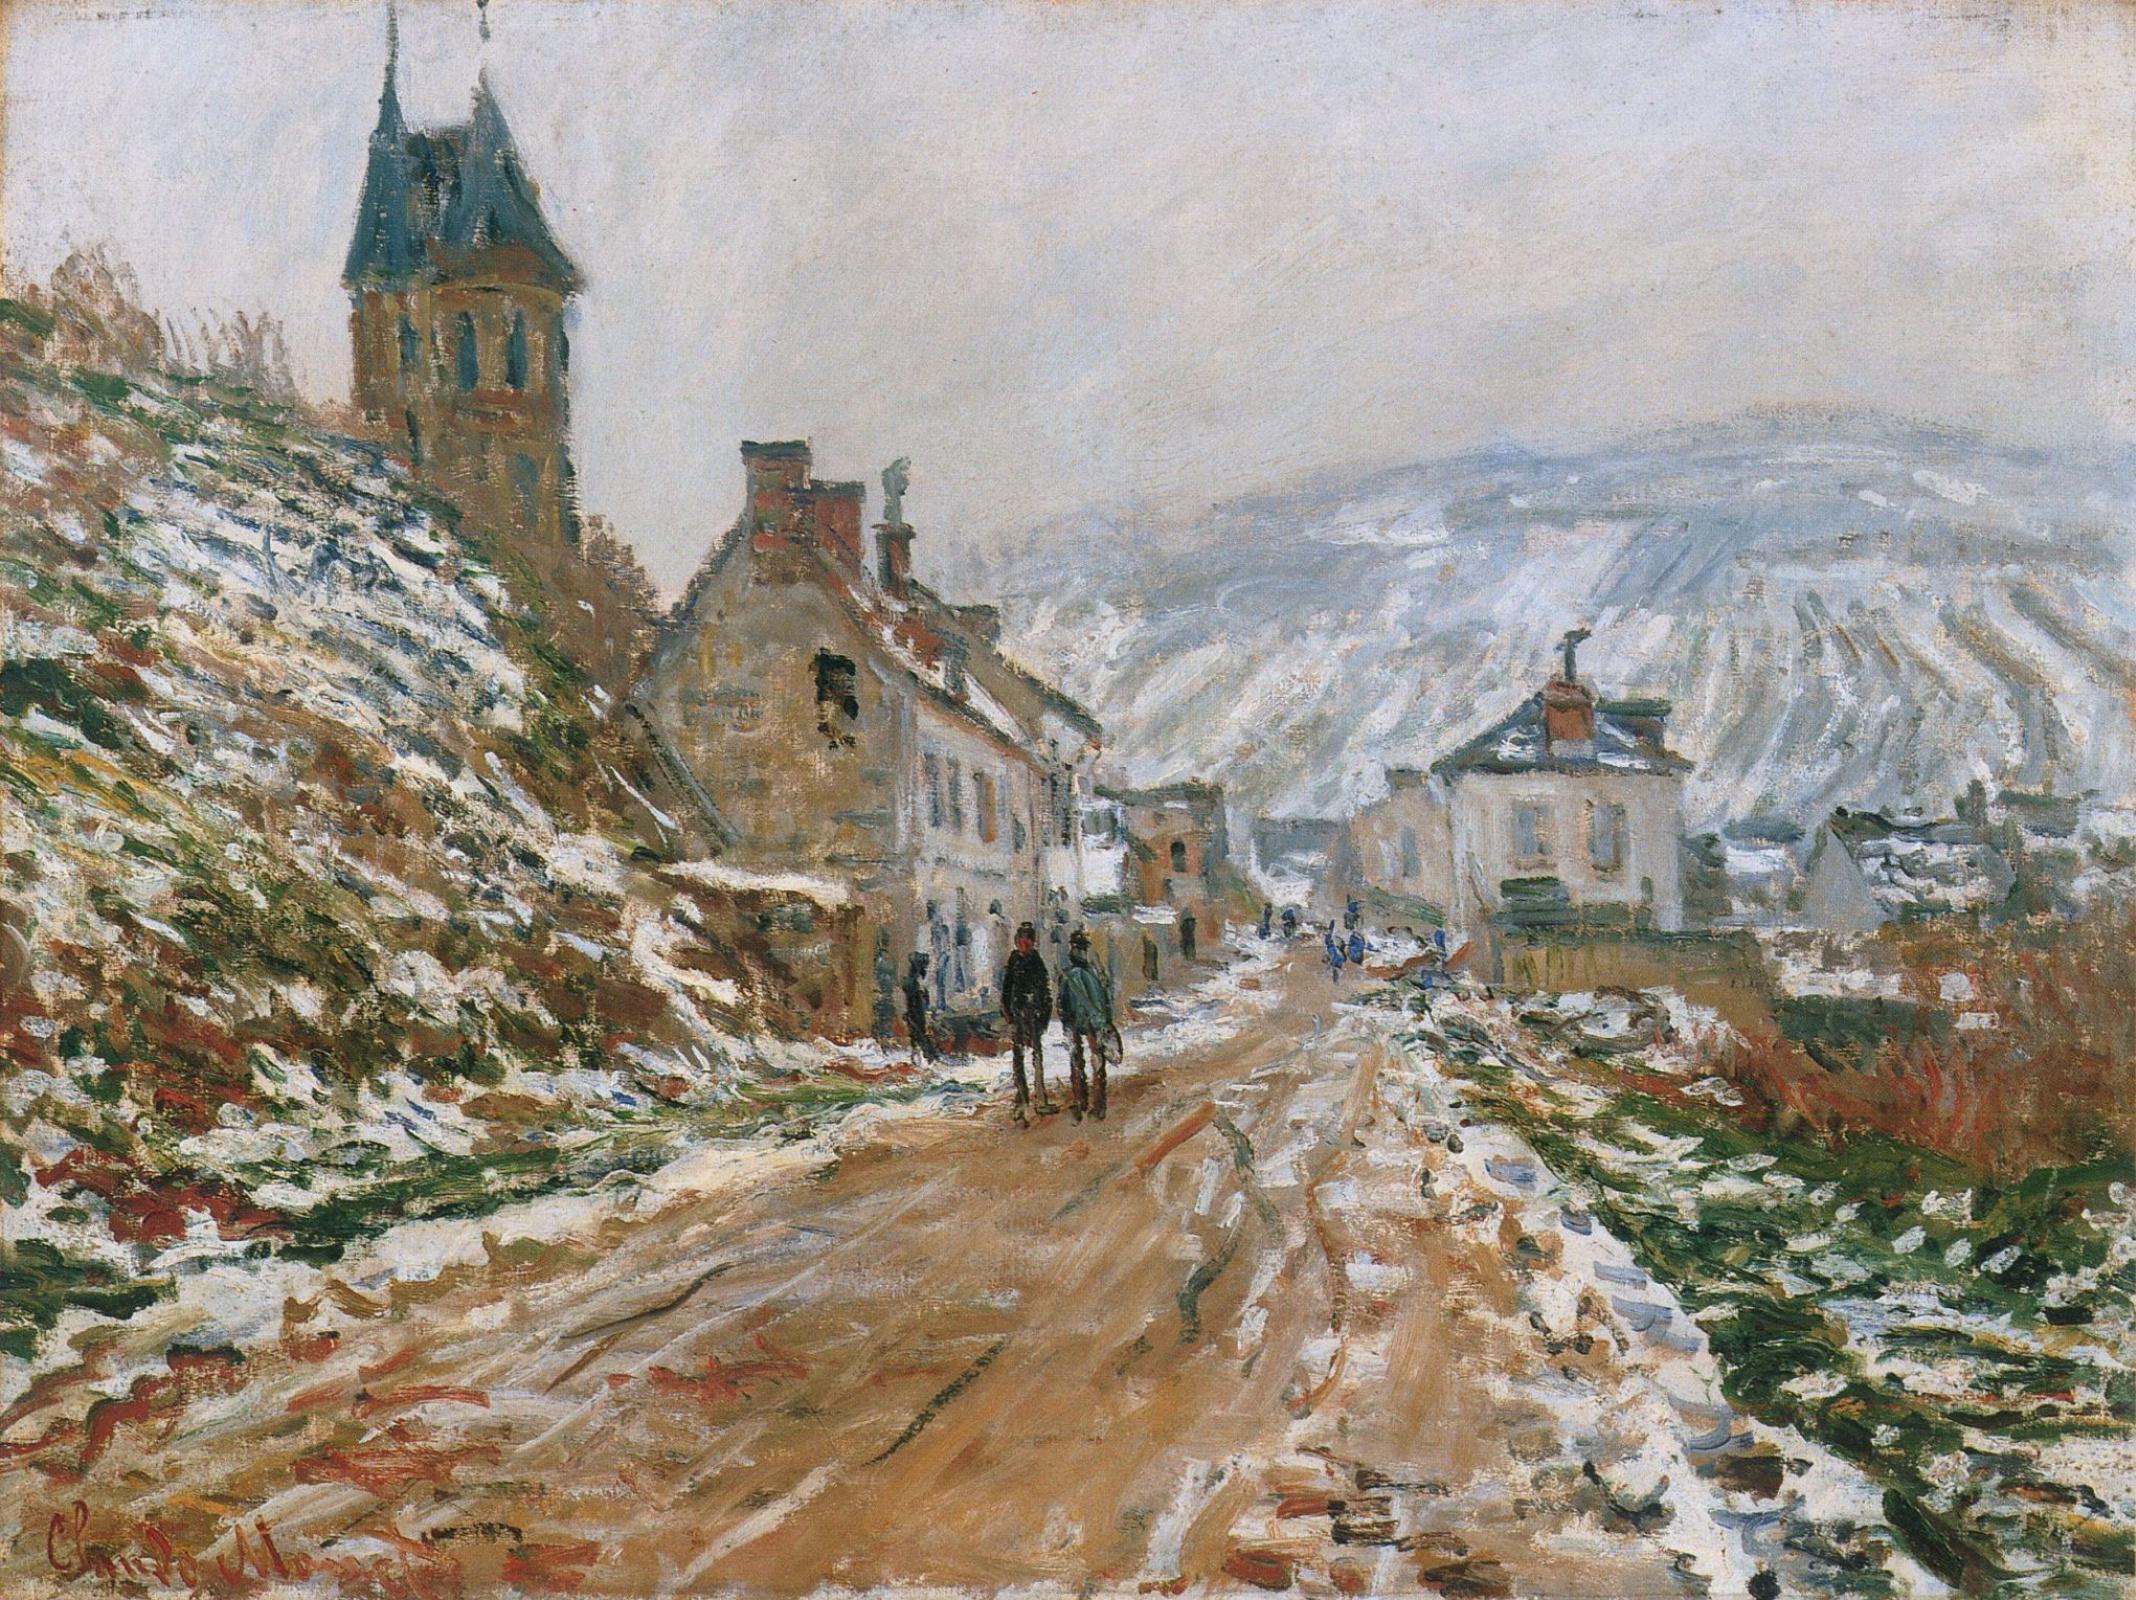 Клод Моне. Дорога в Ветей зимой